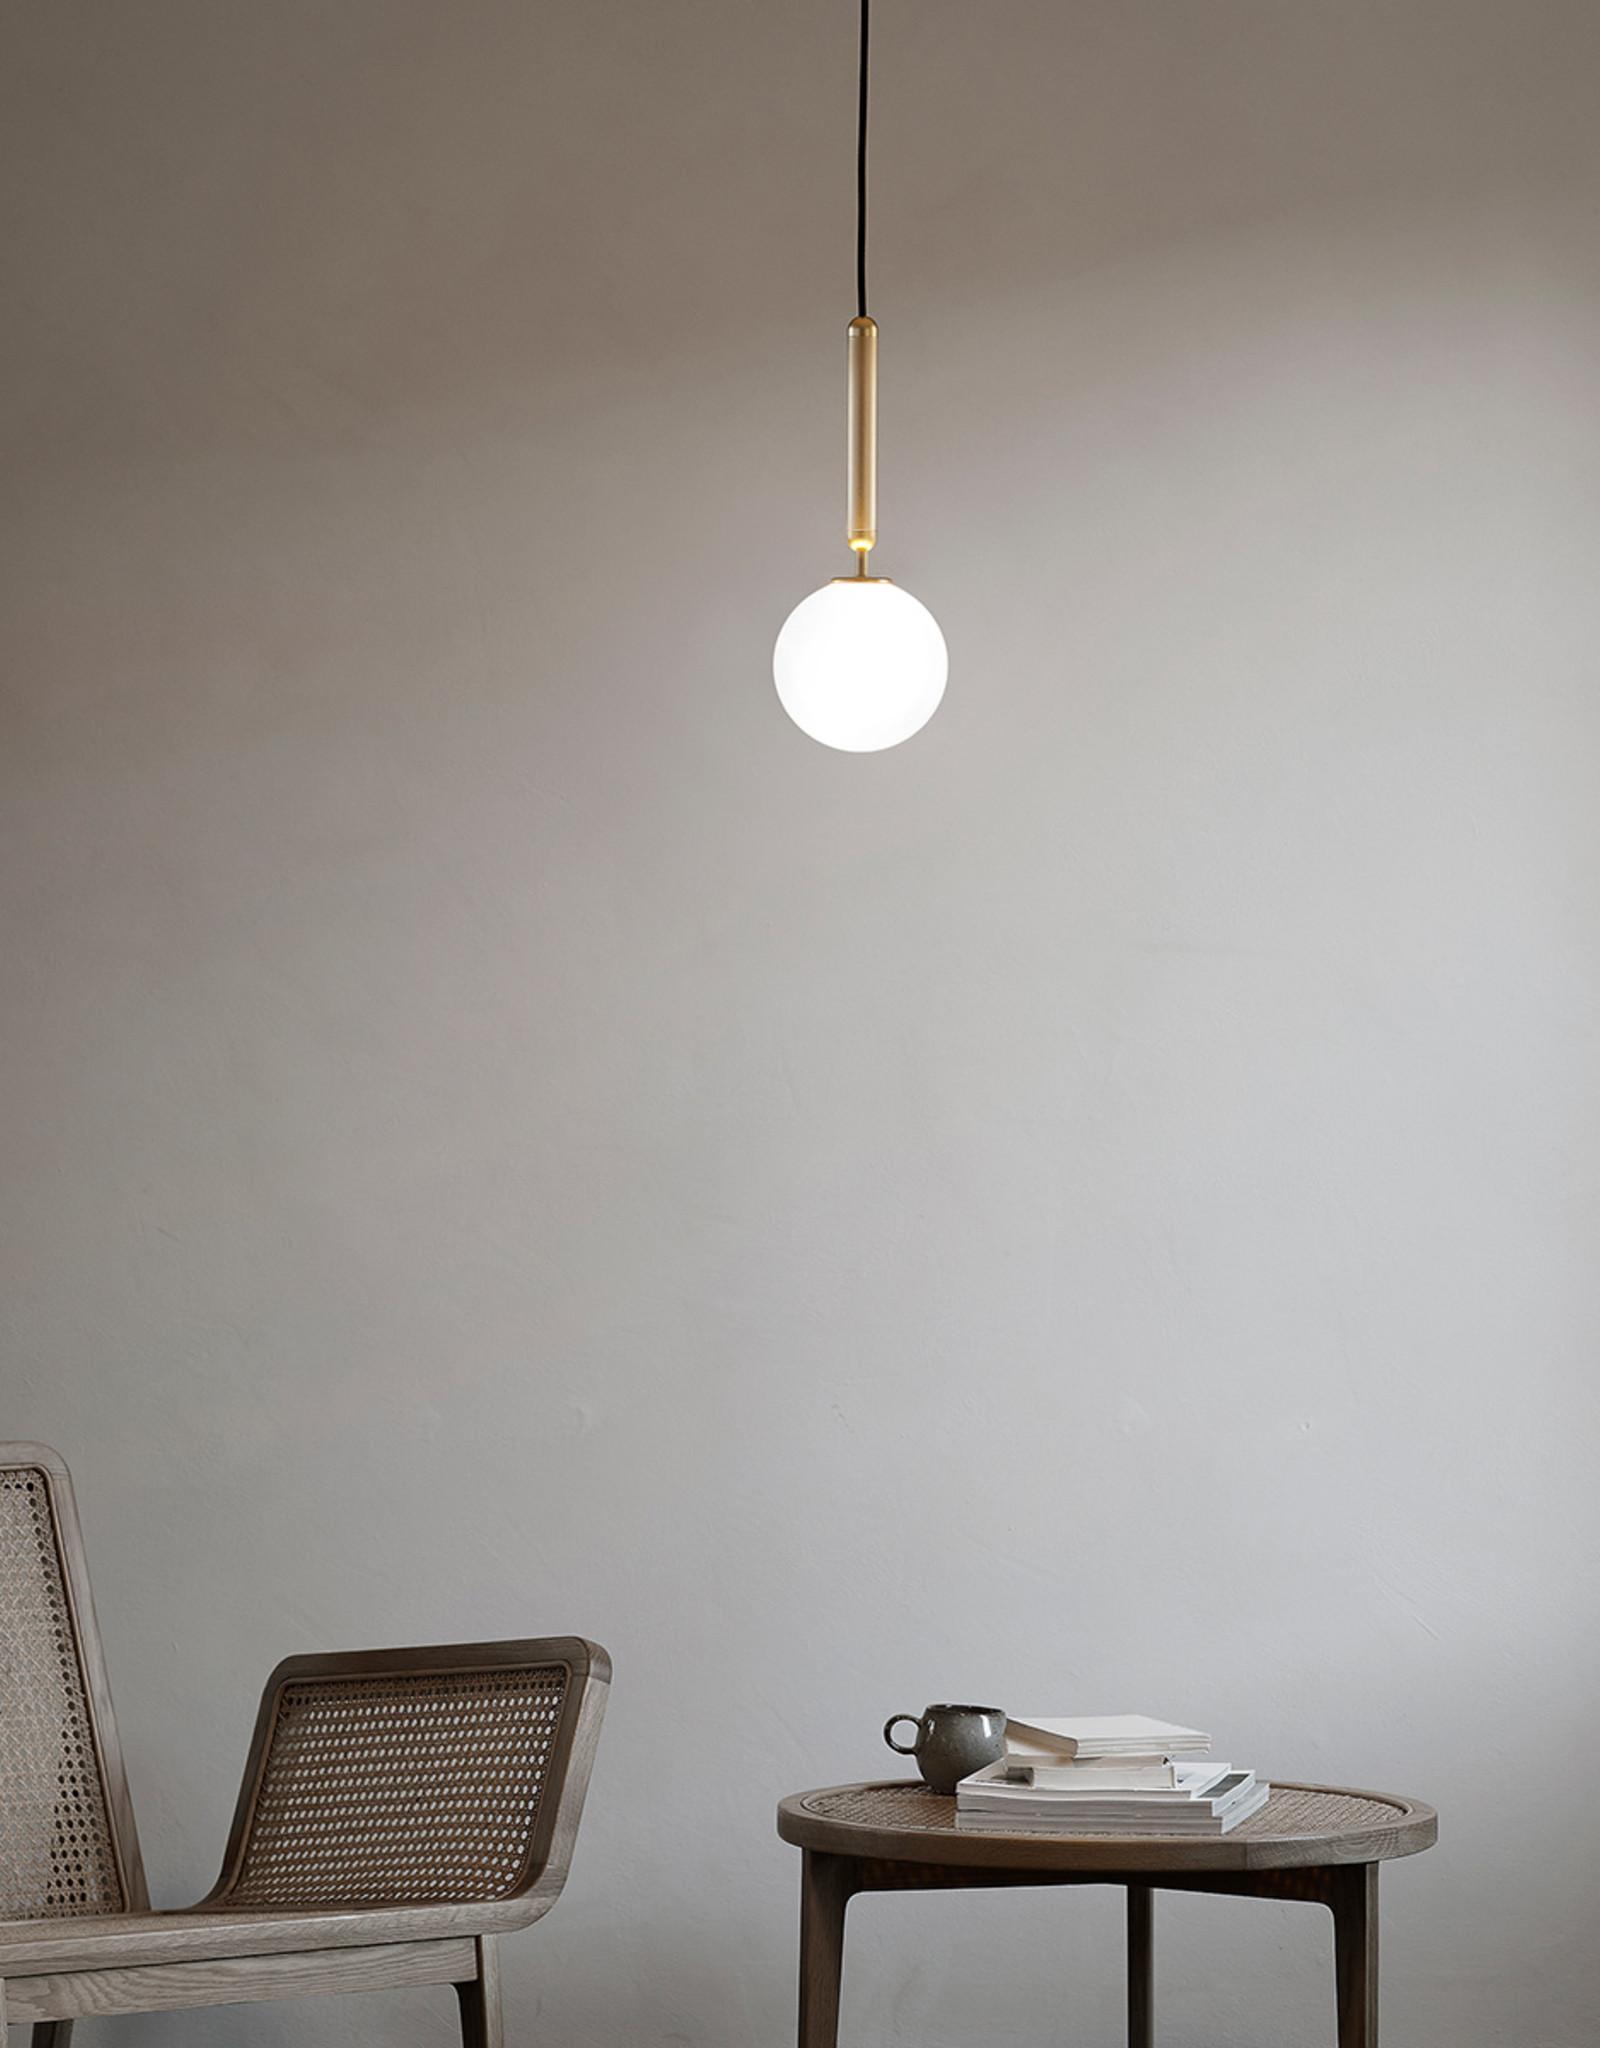 Nuura Miira 1 pendant by Sofie Refer | Brass/opal white